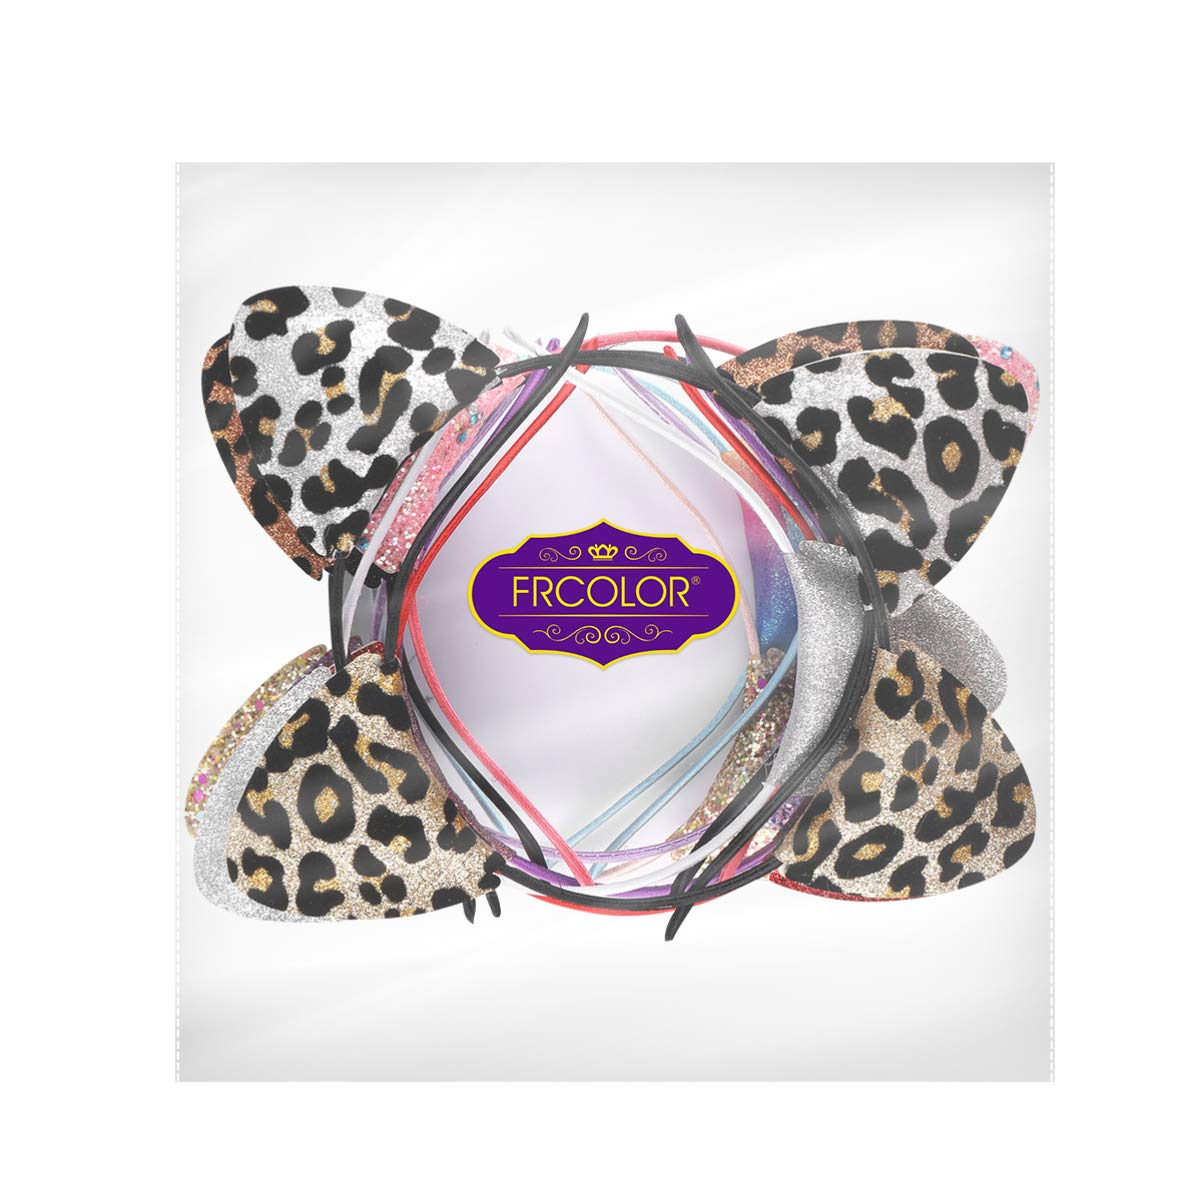 Cat Ears Headband, Double-sided Glitter Sequin Cat Ear Hair Hoops Cute Scrunchies, 12 Pack